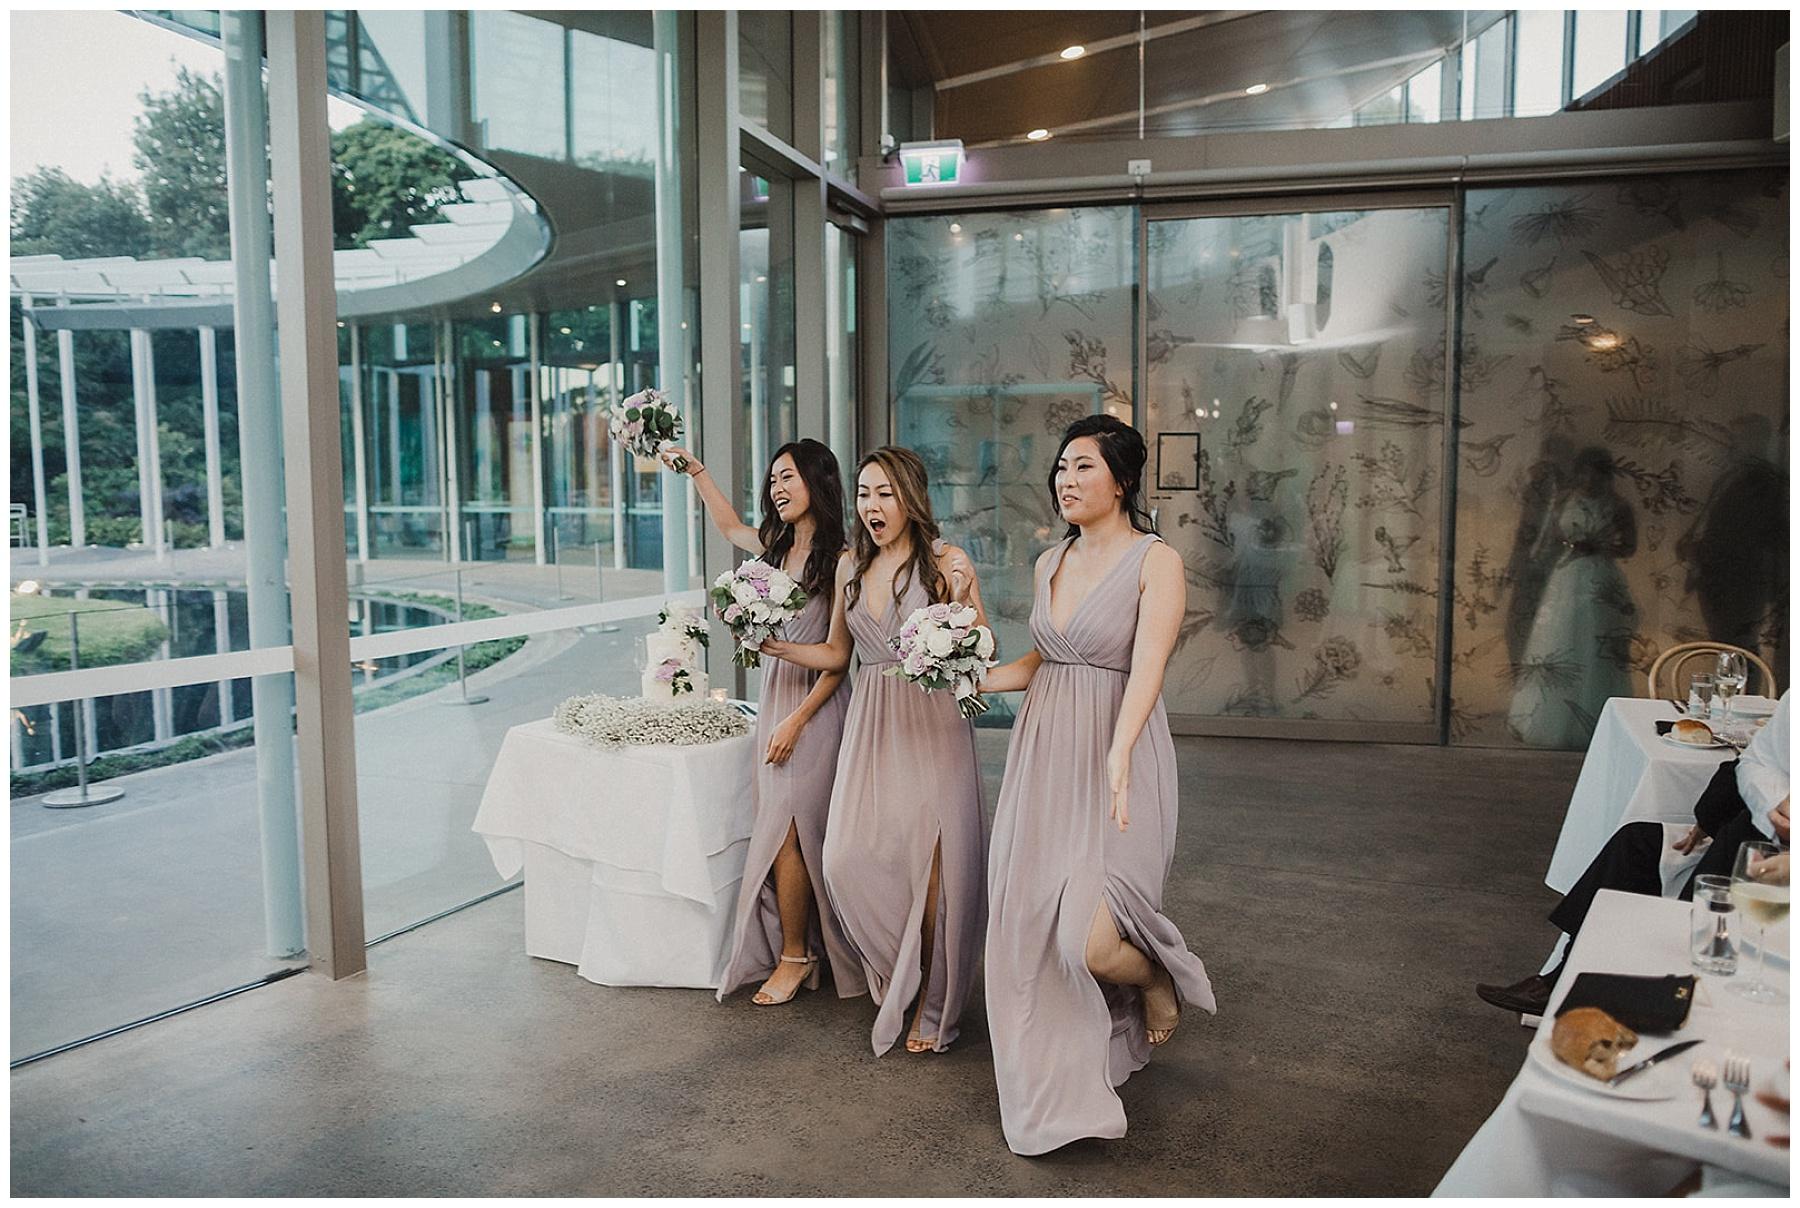 Bridesmaids entrance to wedding reception